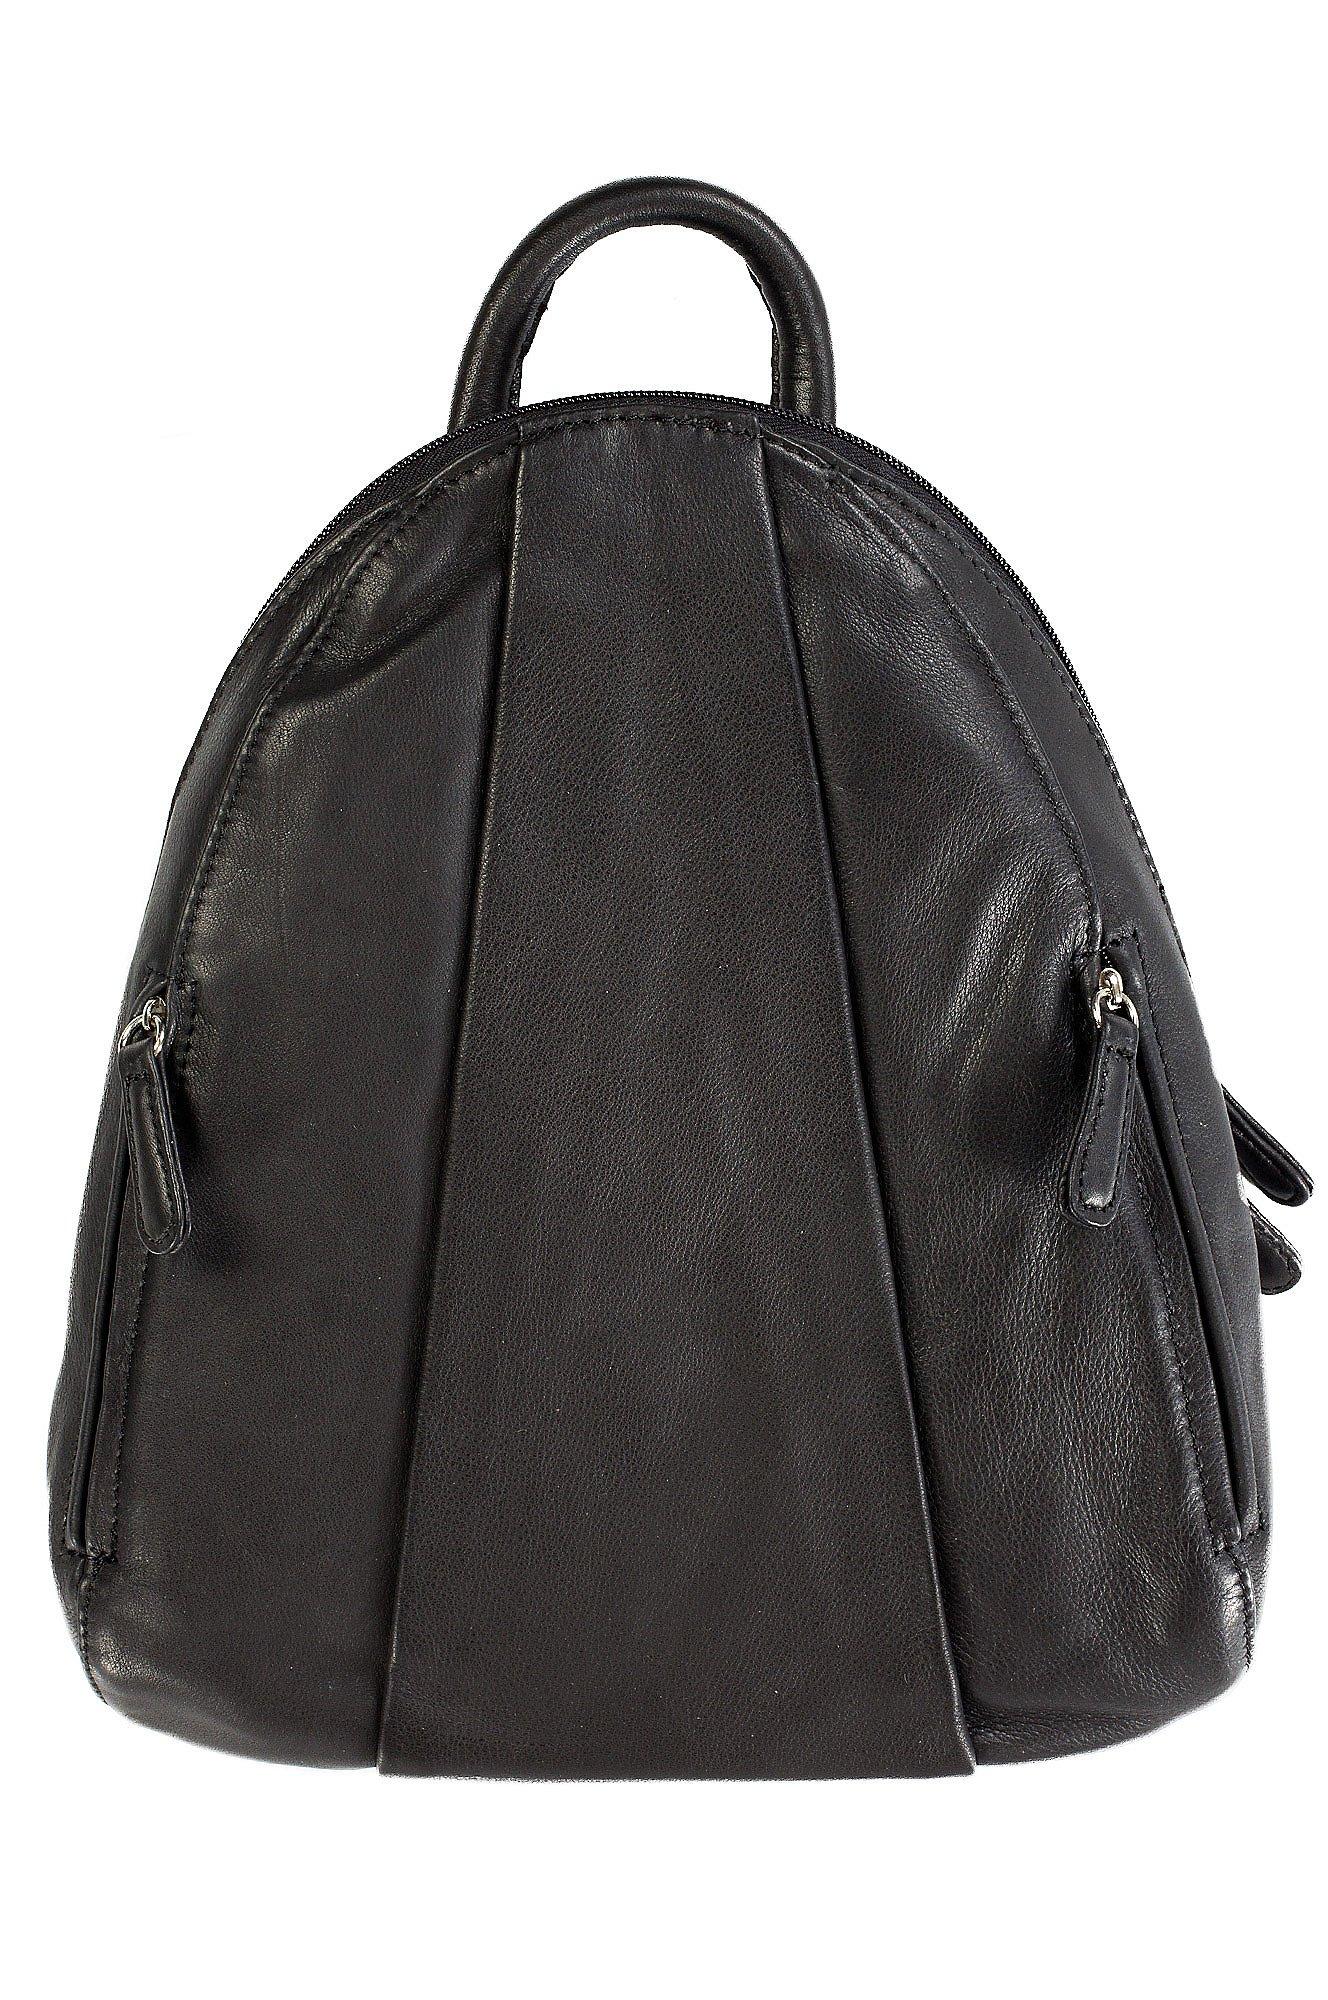 Women's Osgoode Marley Teardrop Leather Backpack Handbag,1 M US,Black